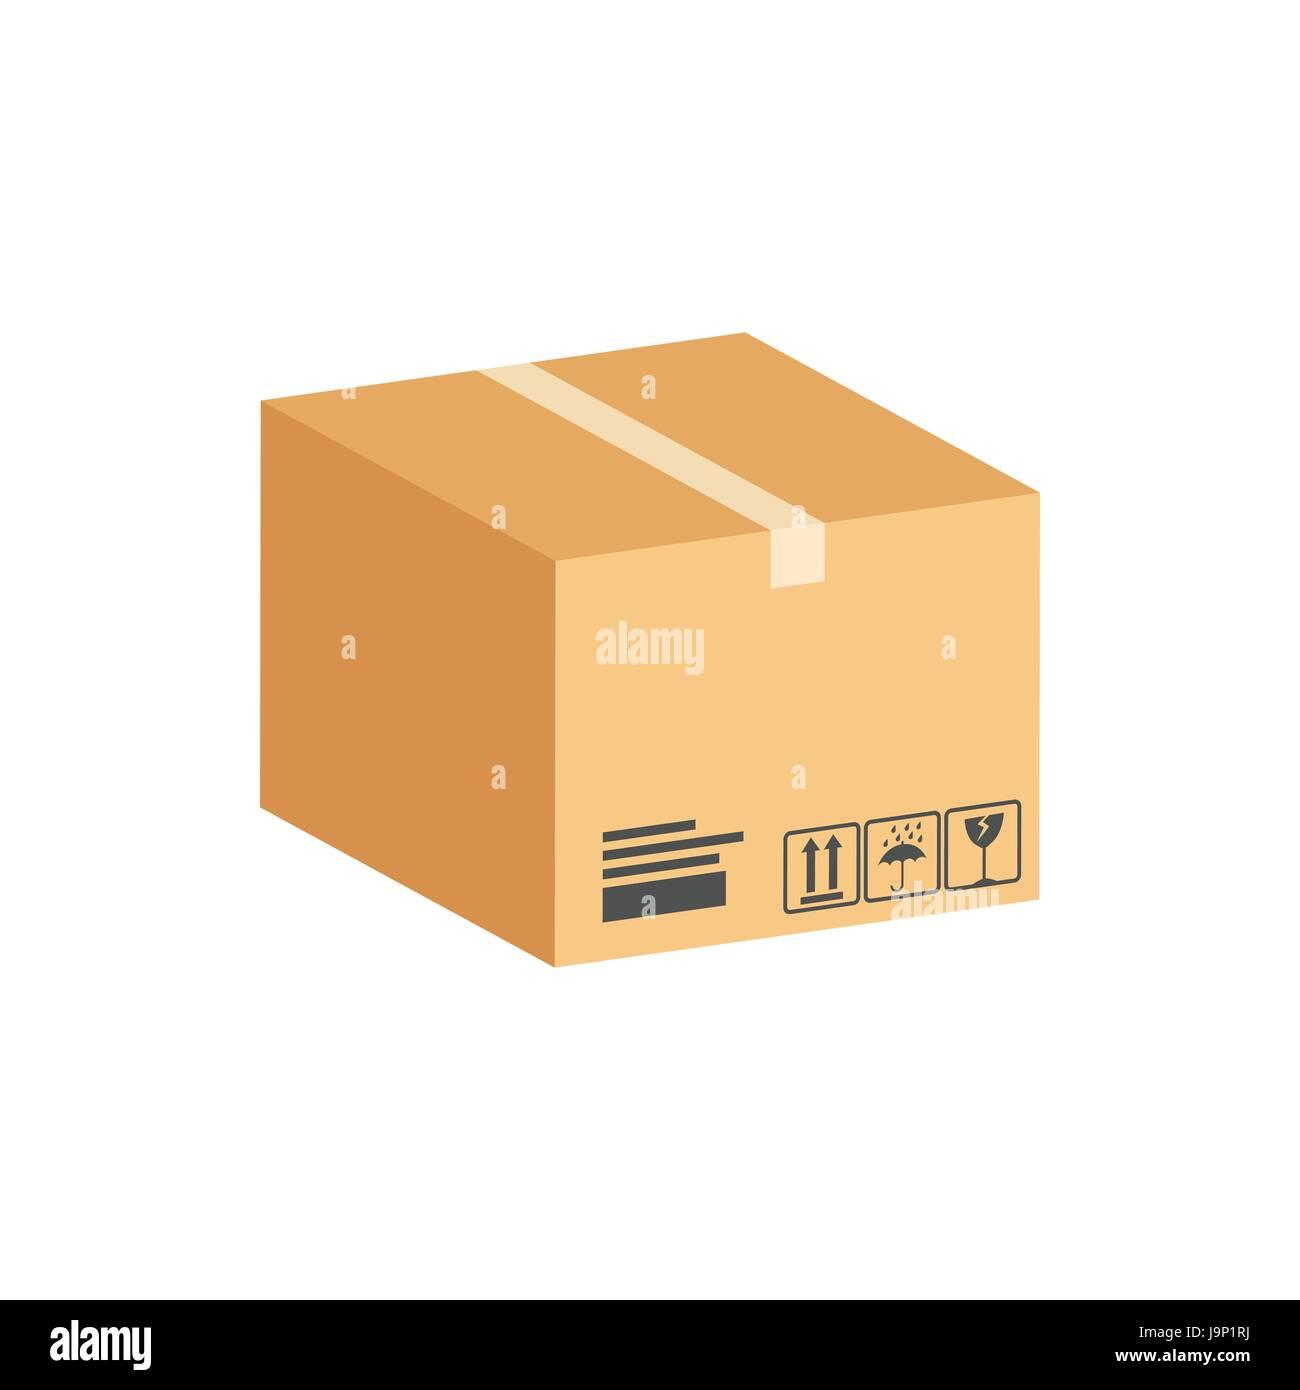 karton paket symbol flache isometrische symbol oder logo 3d style piktogramm f r web design. Black Bedroom Furniture Sets. Home Design Ideas